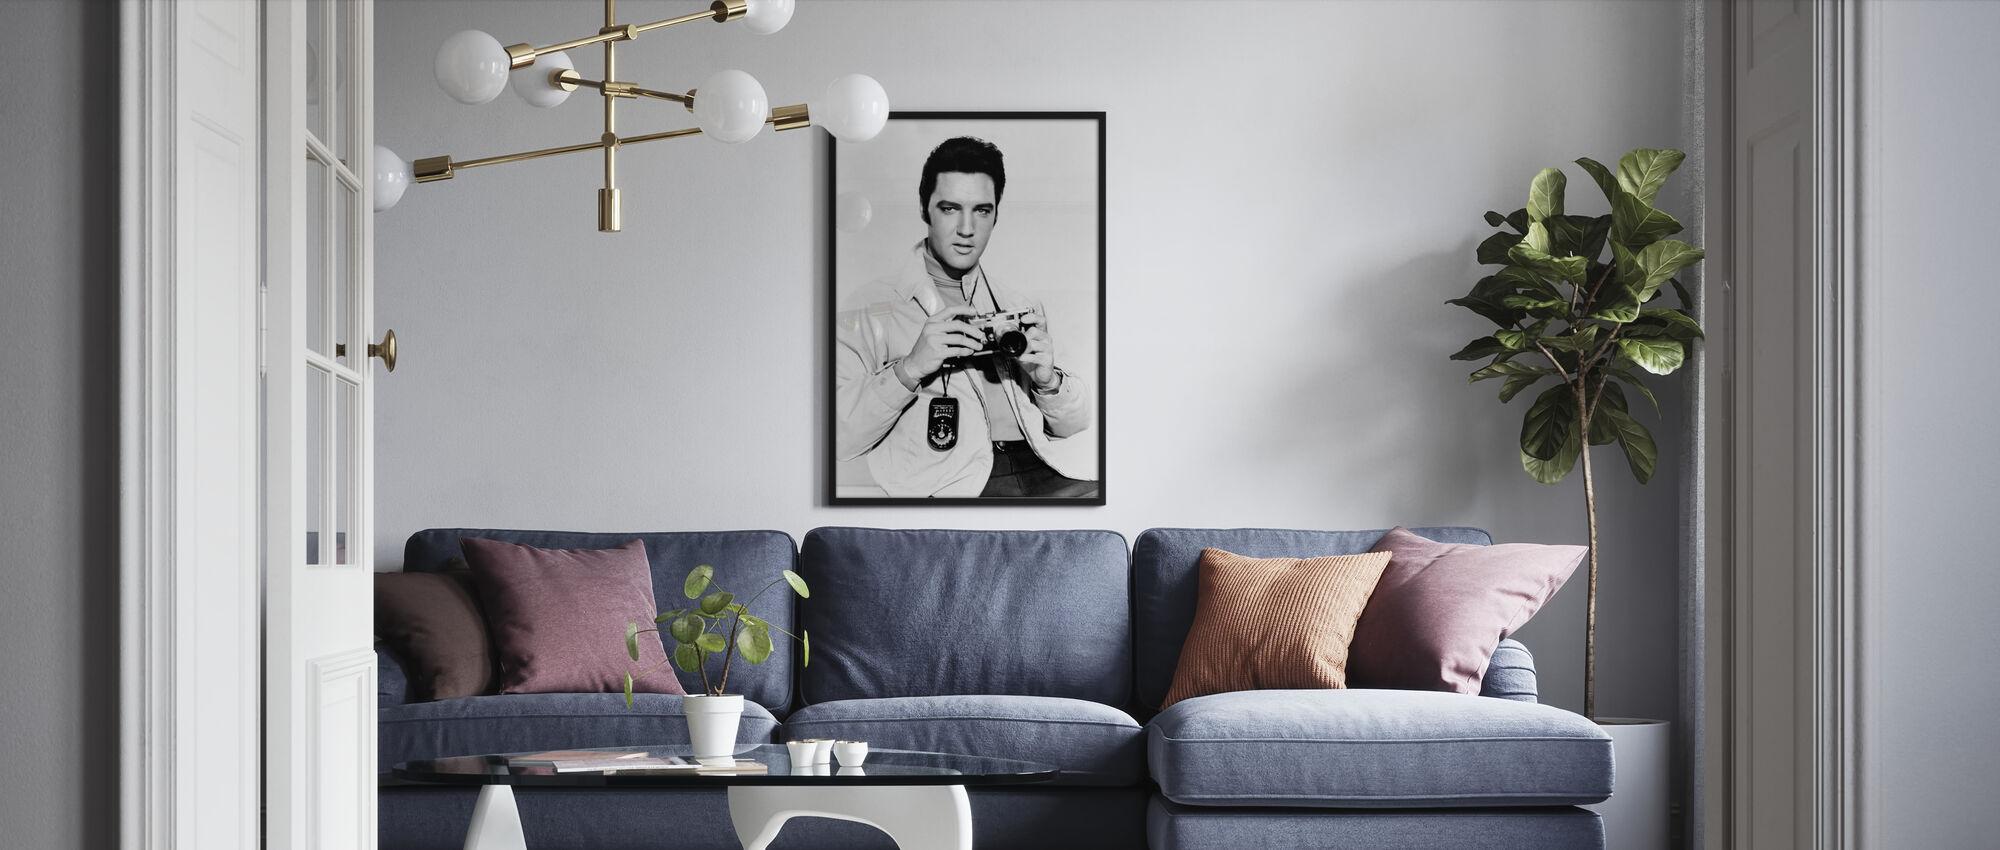 Live a Little, Love a Little - Poster - Living Room